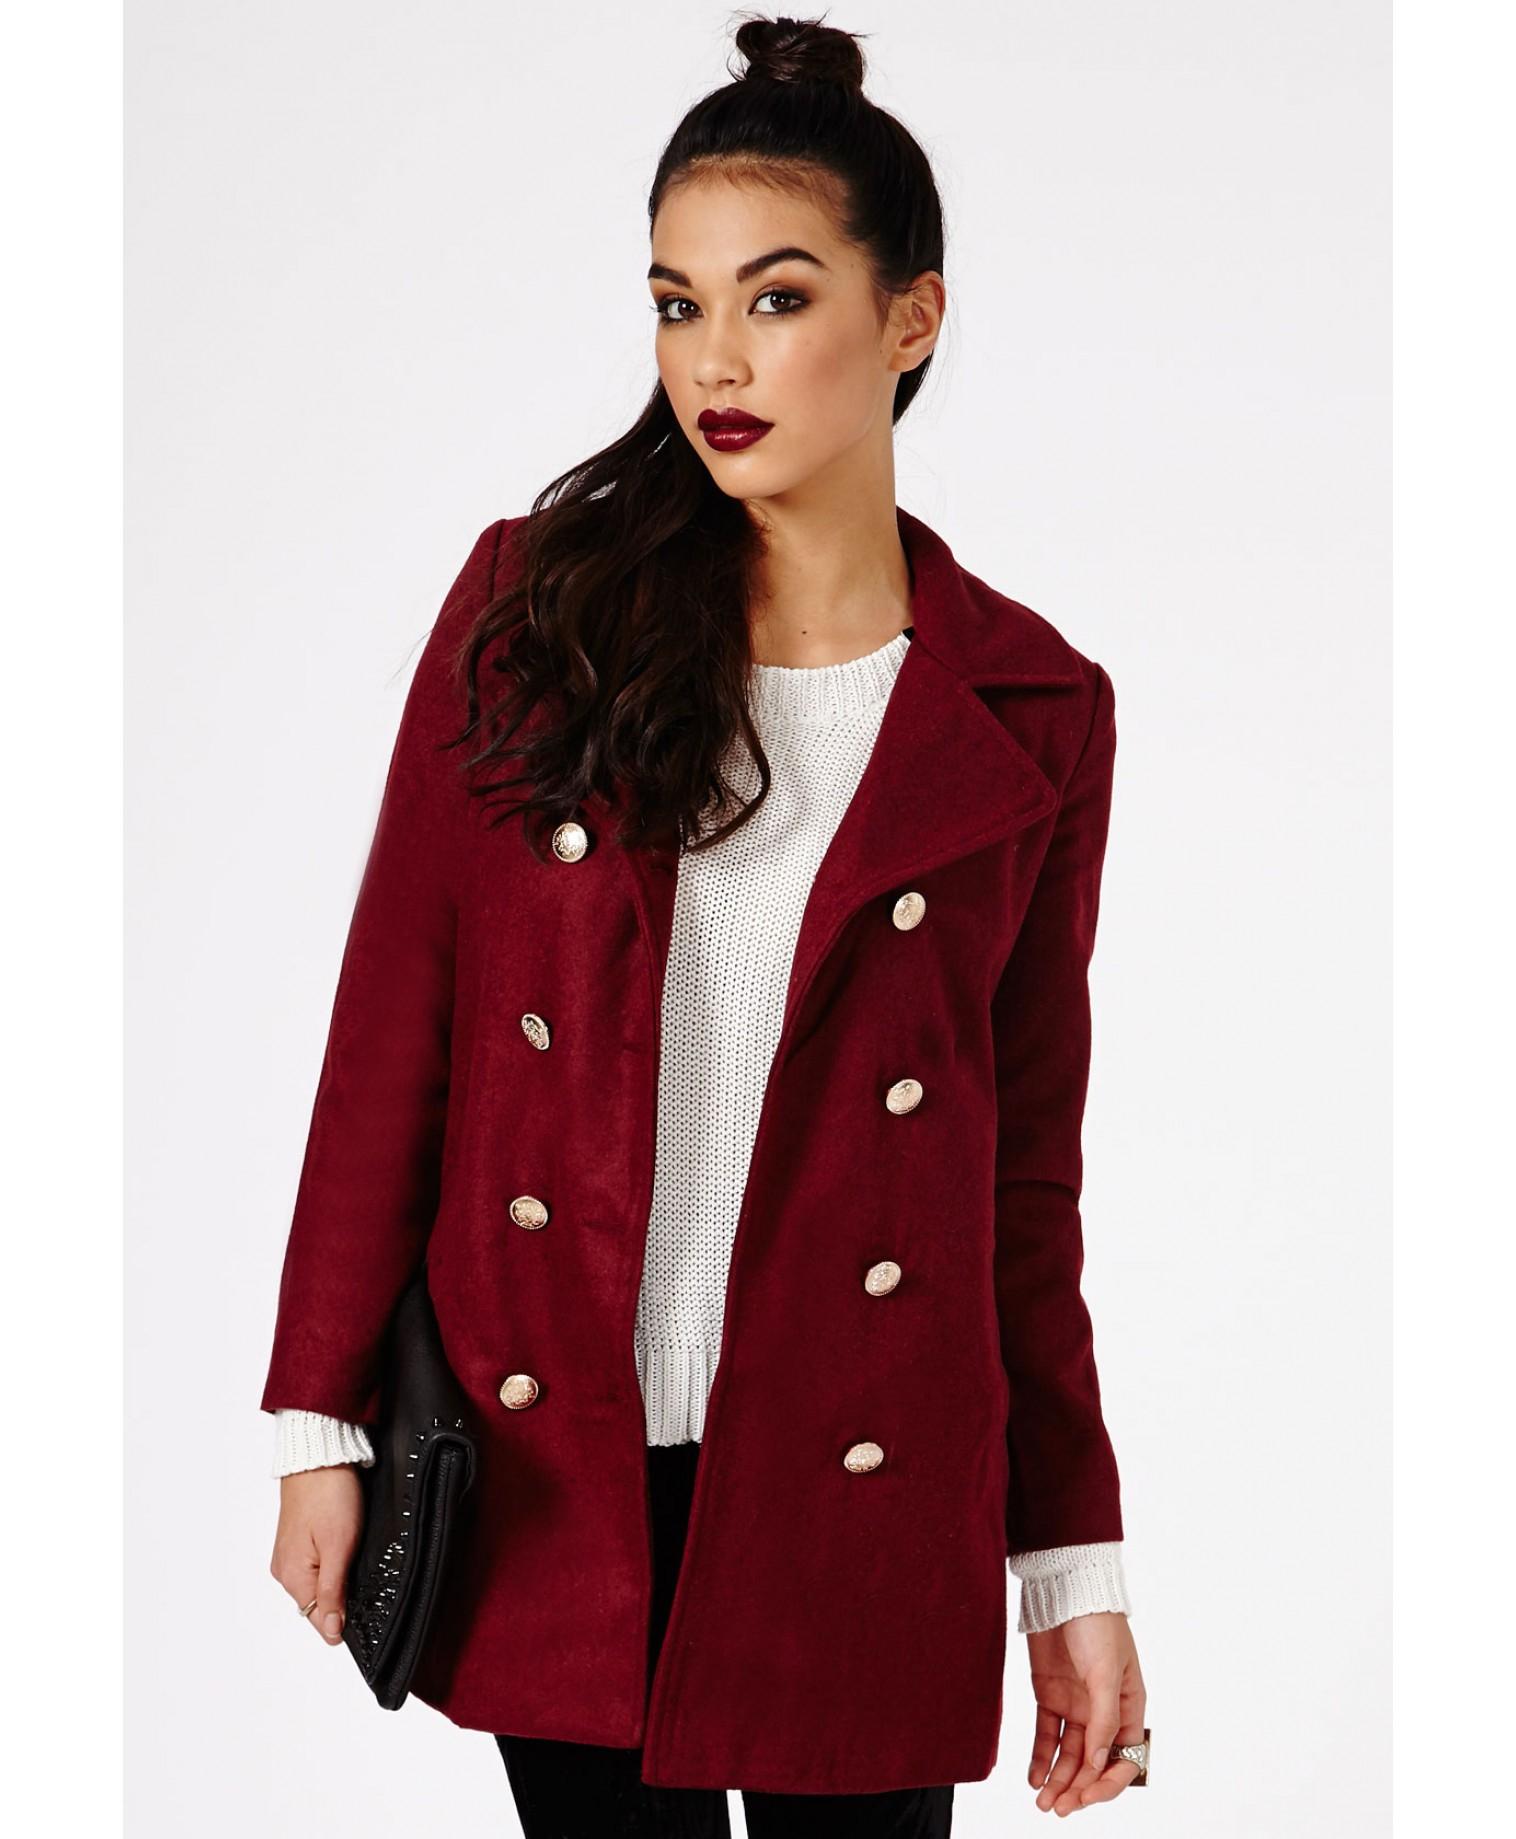 Missguided Kazumita Military Coat in Burgundy in Red | Lyst